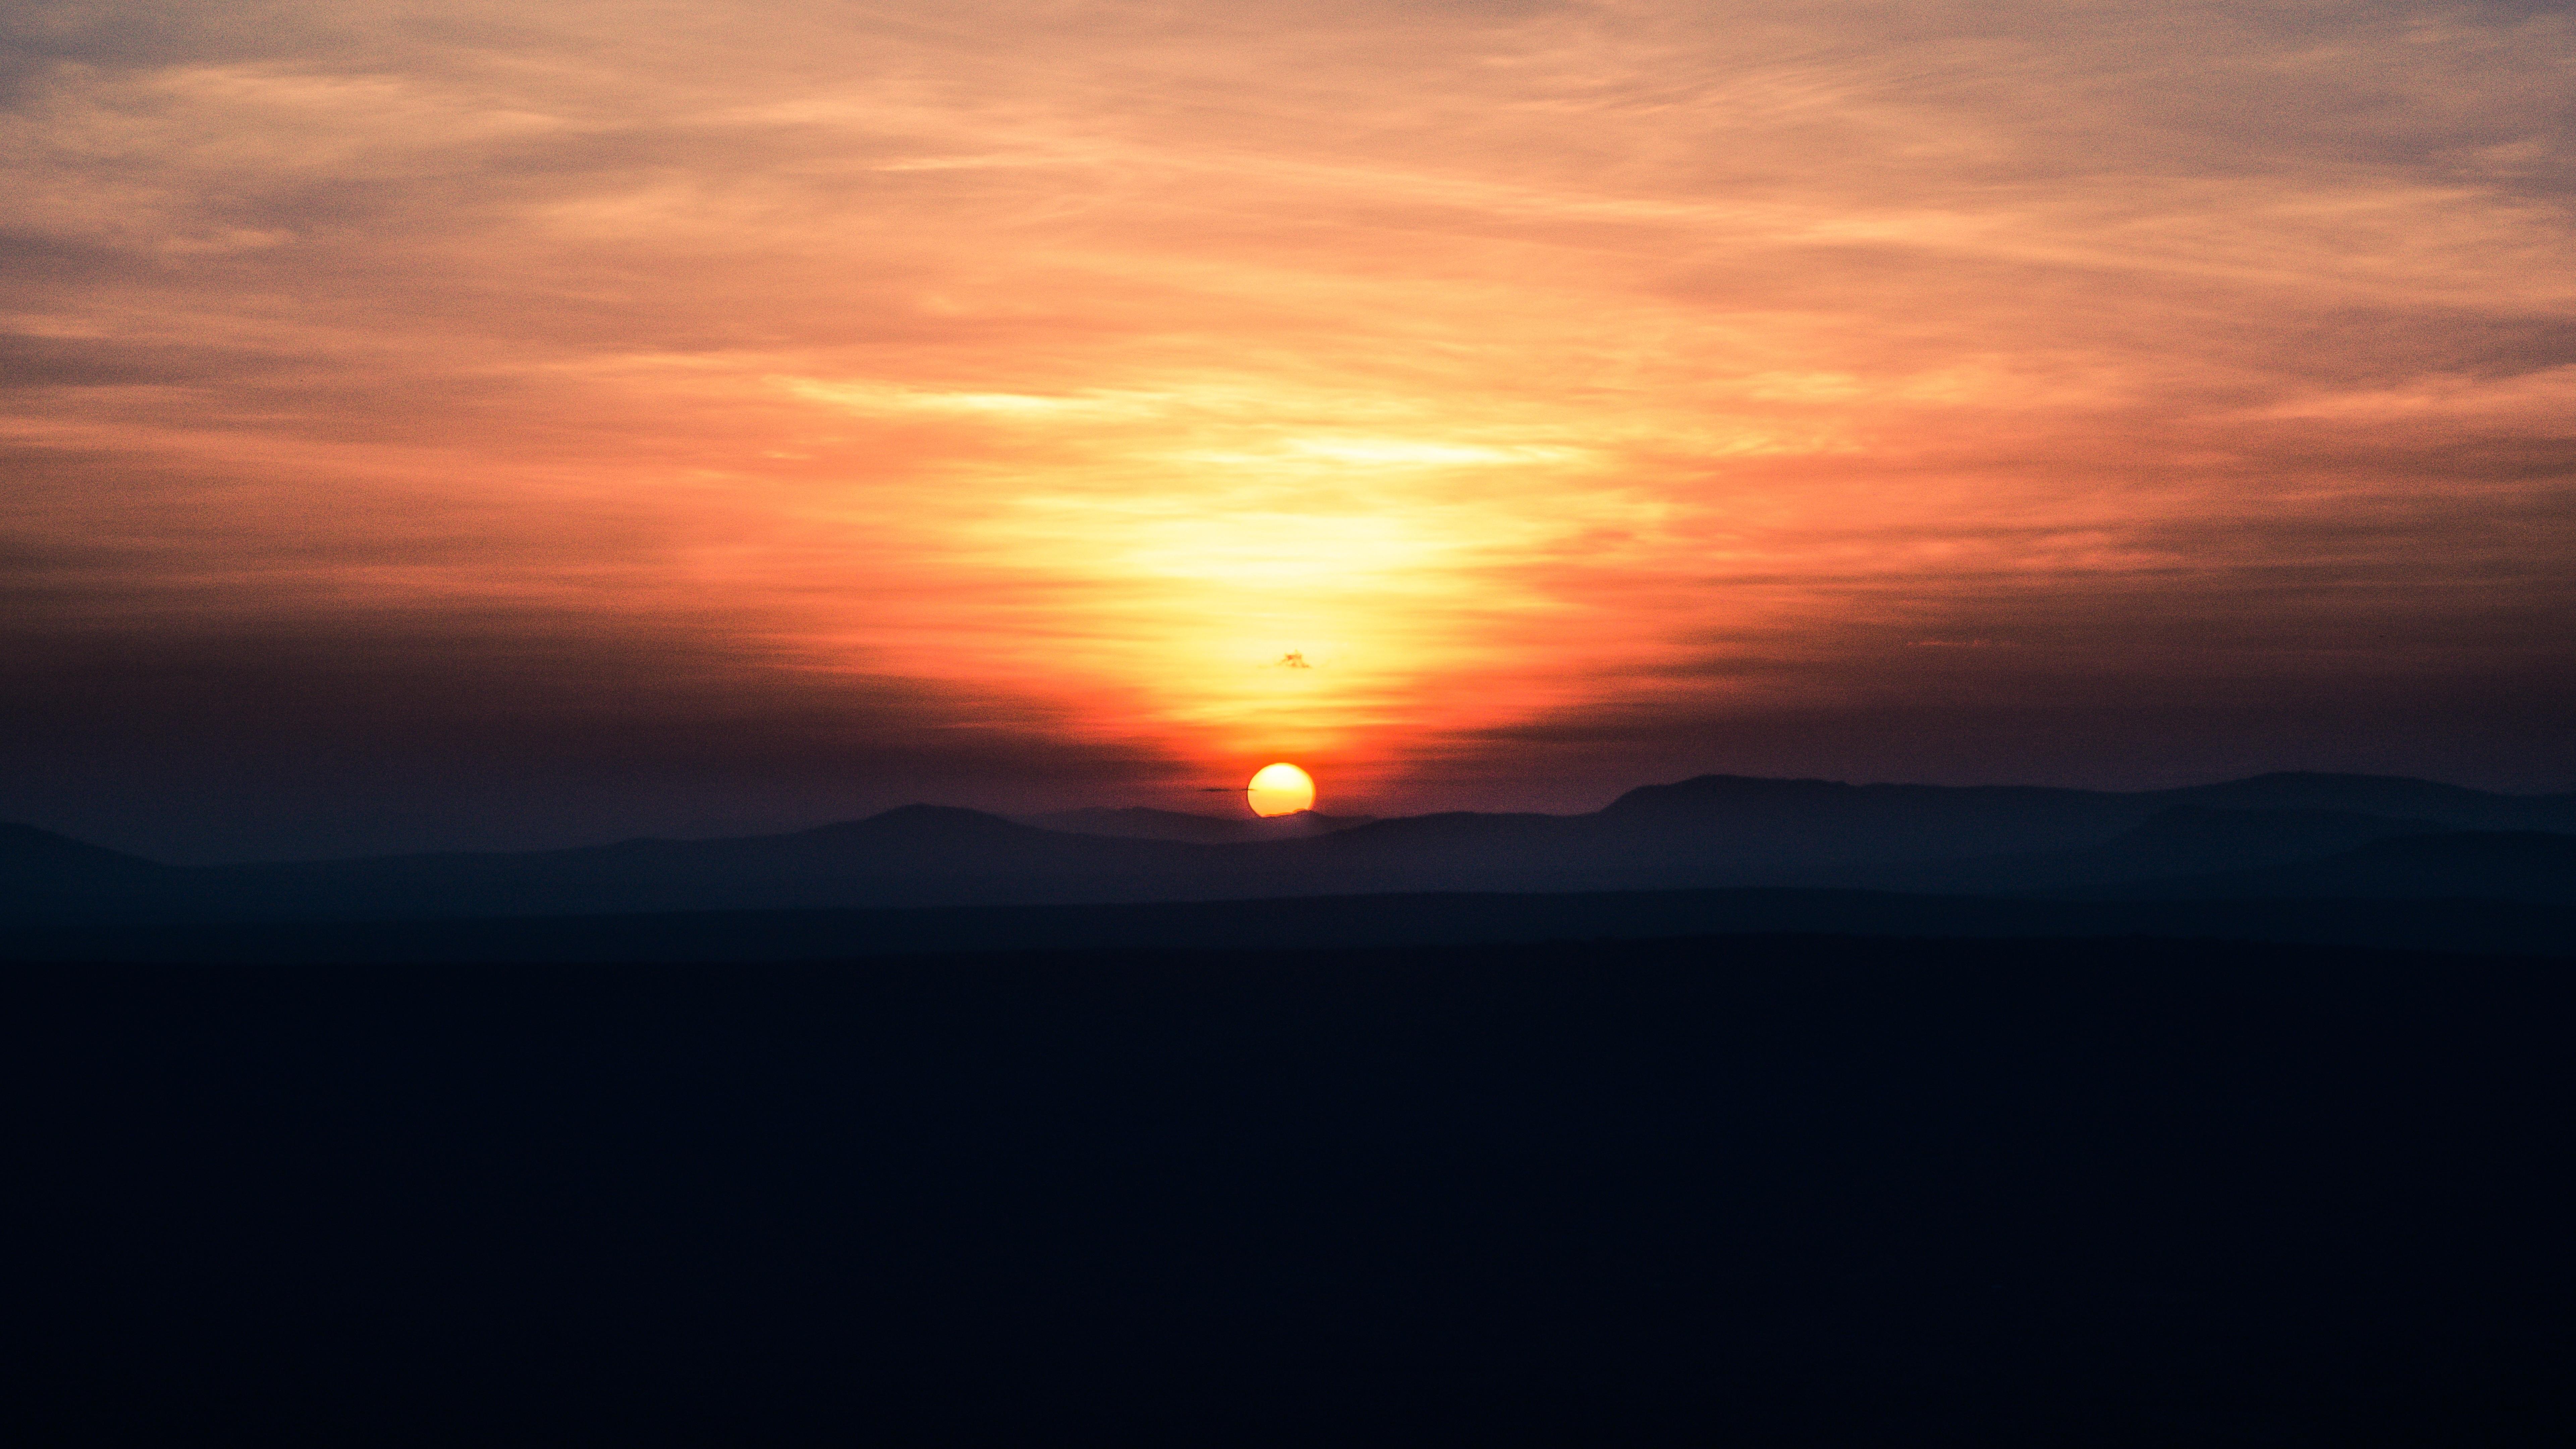 7680x4320 8k Sunset 8k HD 4k Wallpapers